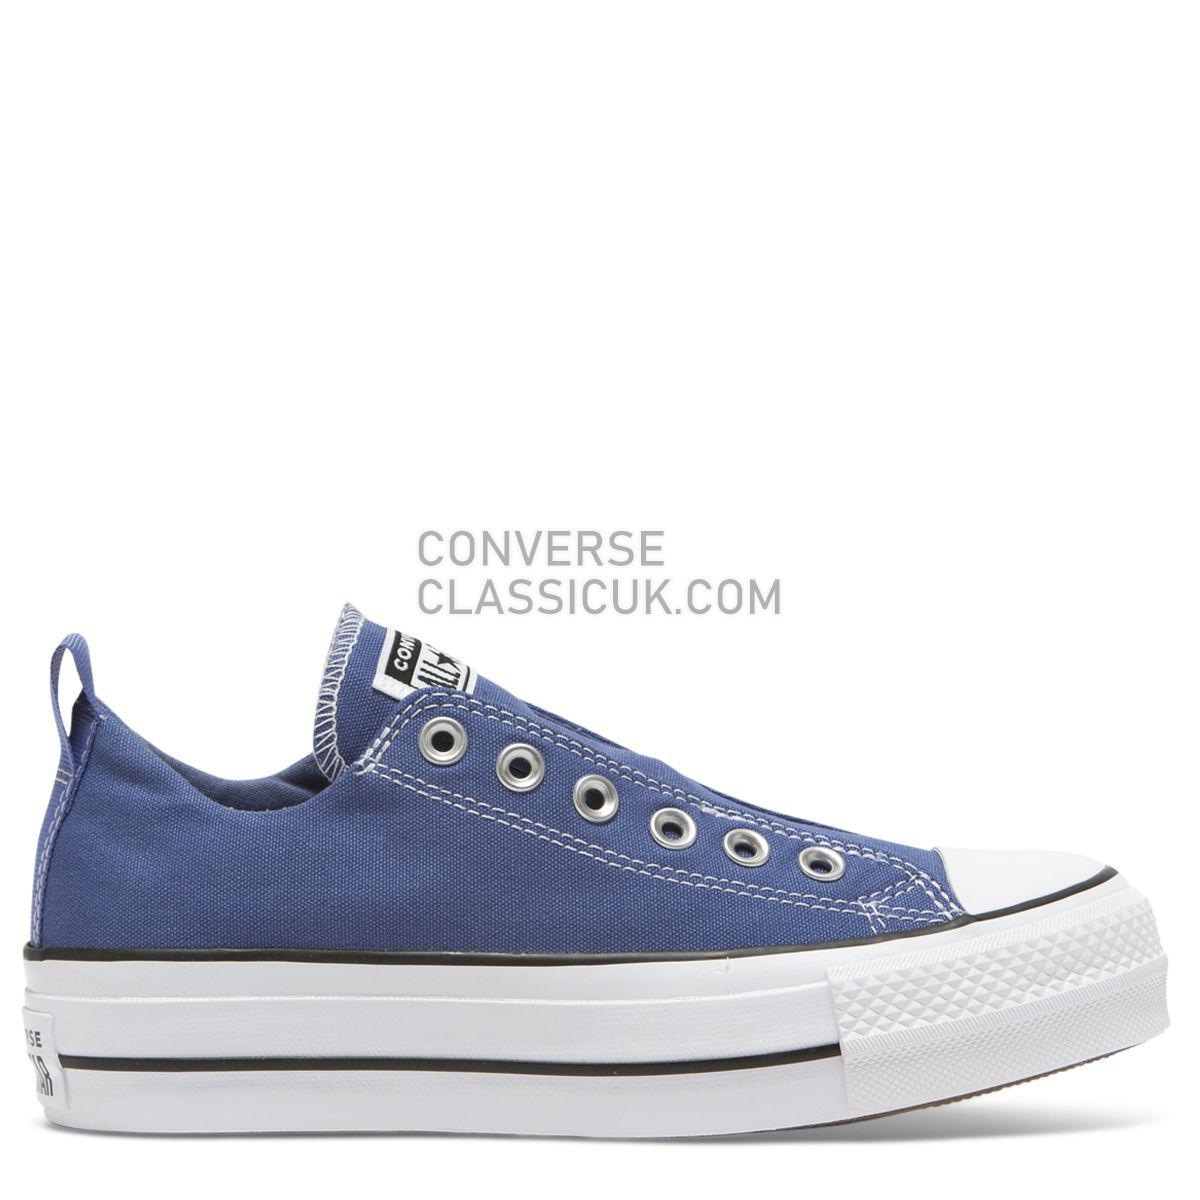 Converse Chuck Taylor All Star Lift Cali Mood Slip Low Top Washed Indigo Womens 564339 Washed Indigo/White/Black Shoes